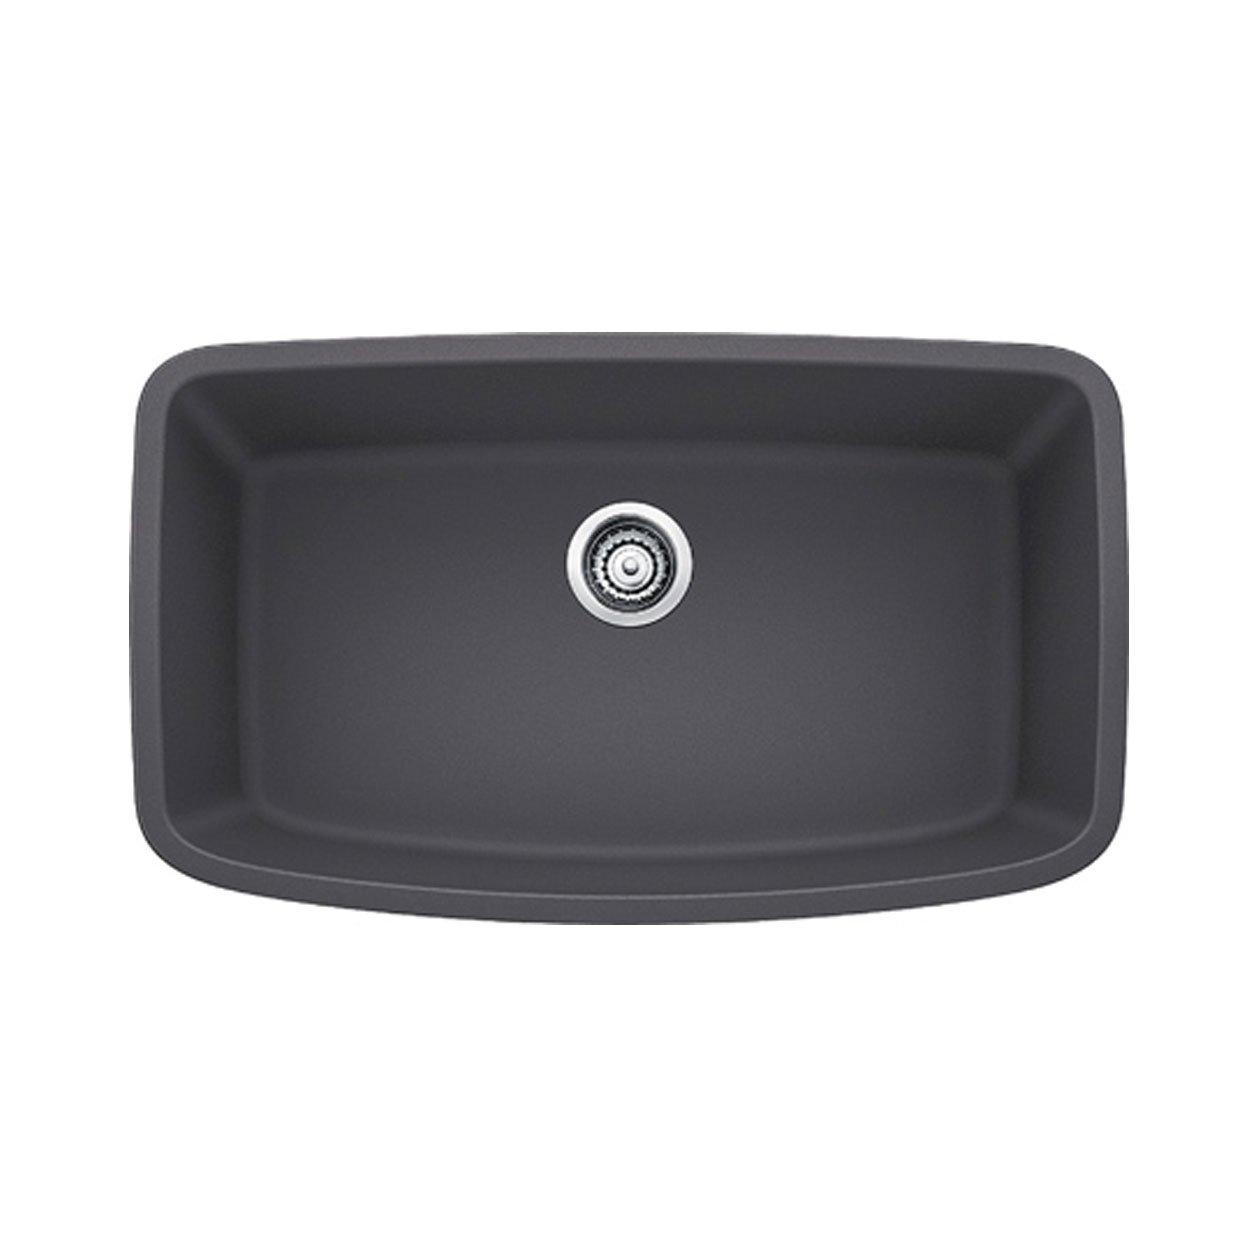 b ie UTF8&node single bowl kitchen sink Blanco Valea Super Undermount Single Bowl Kitchen Sink Large Cinder